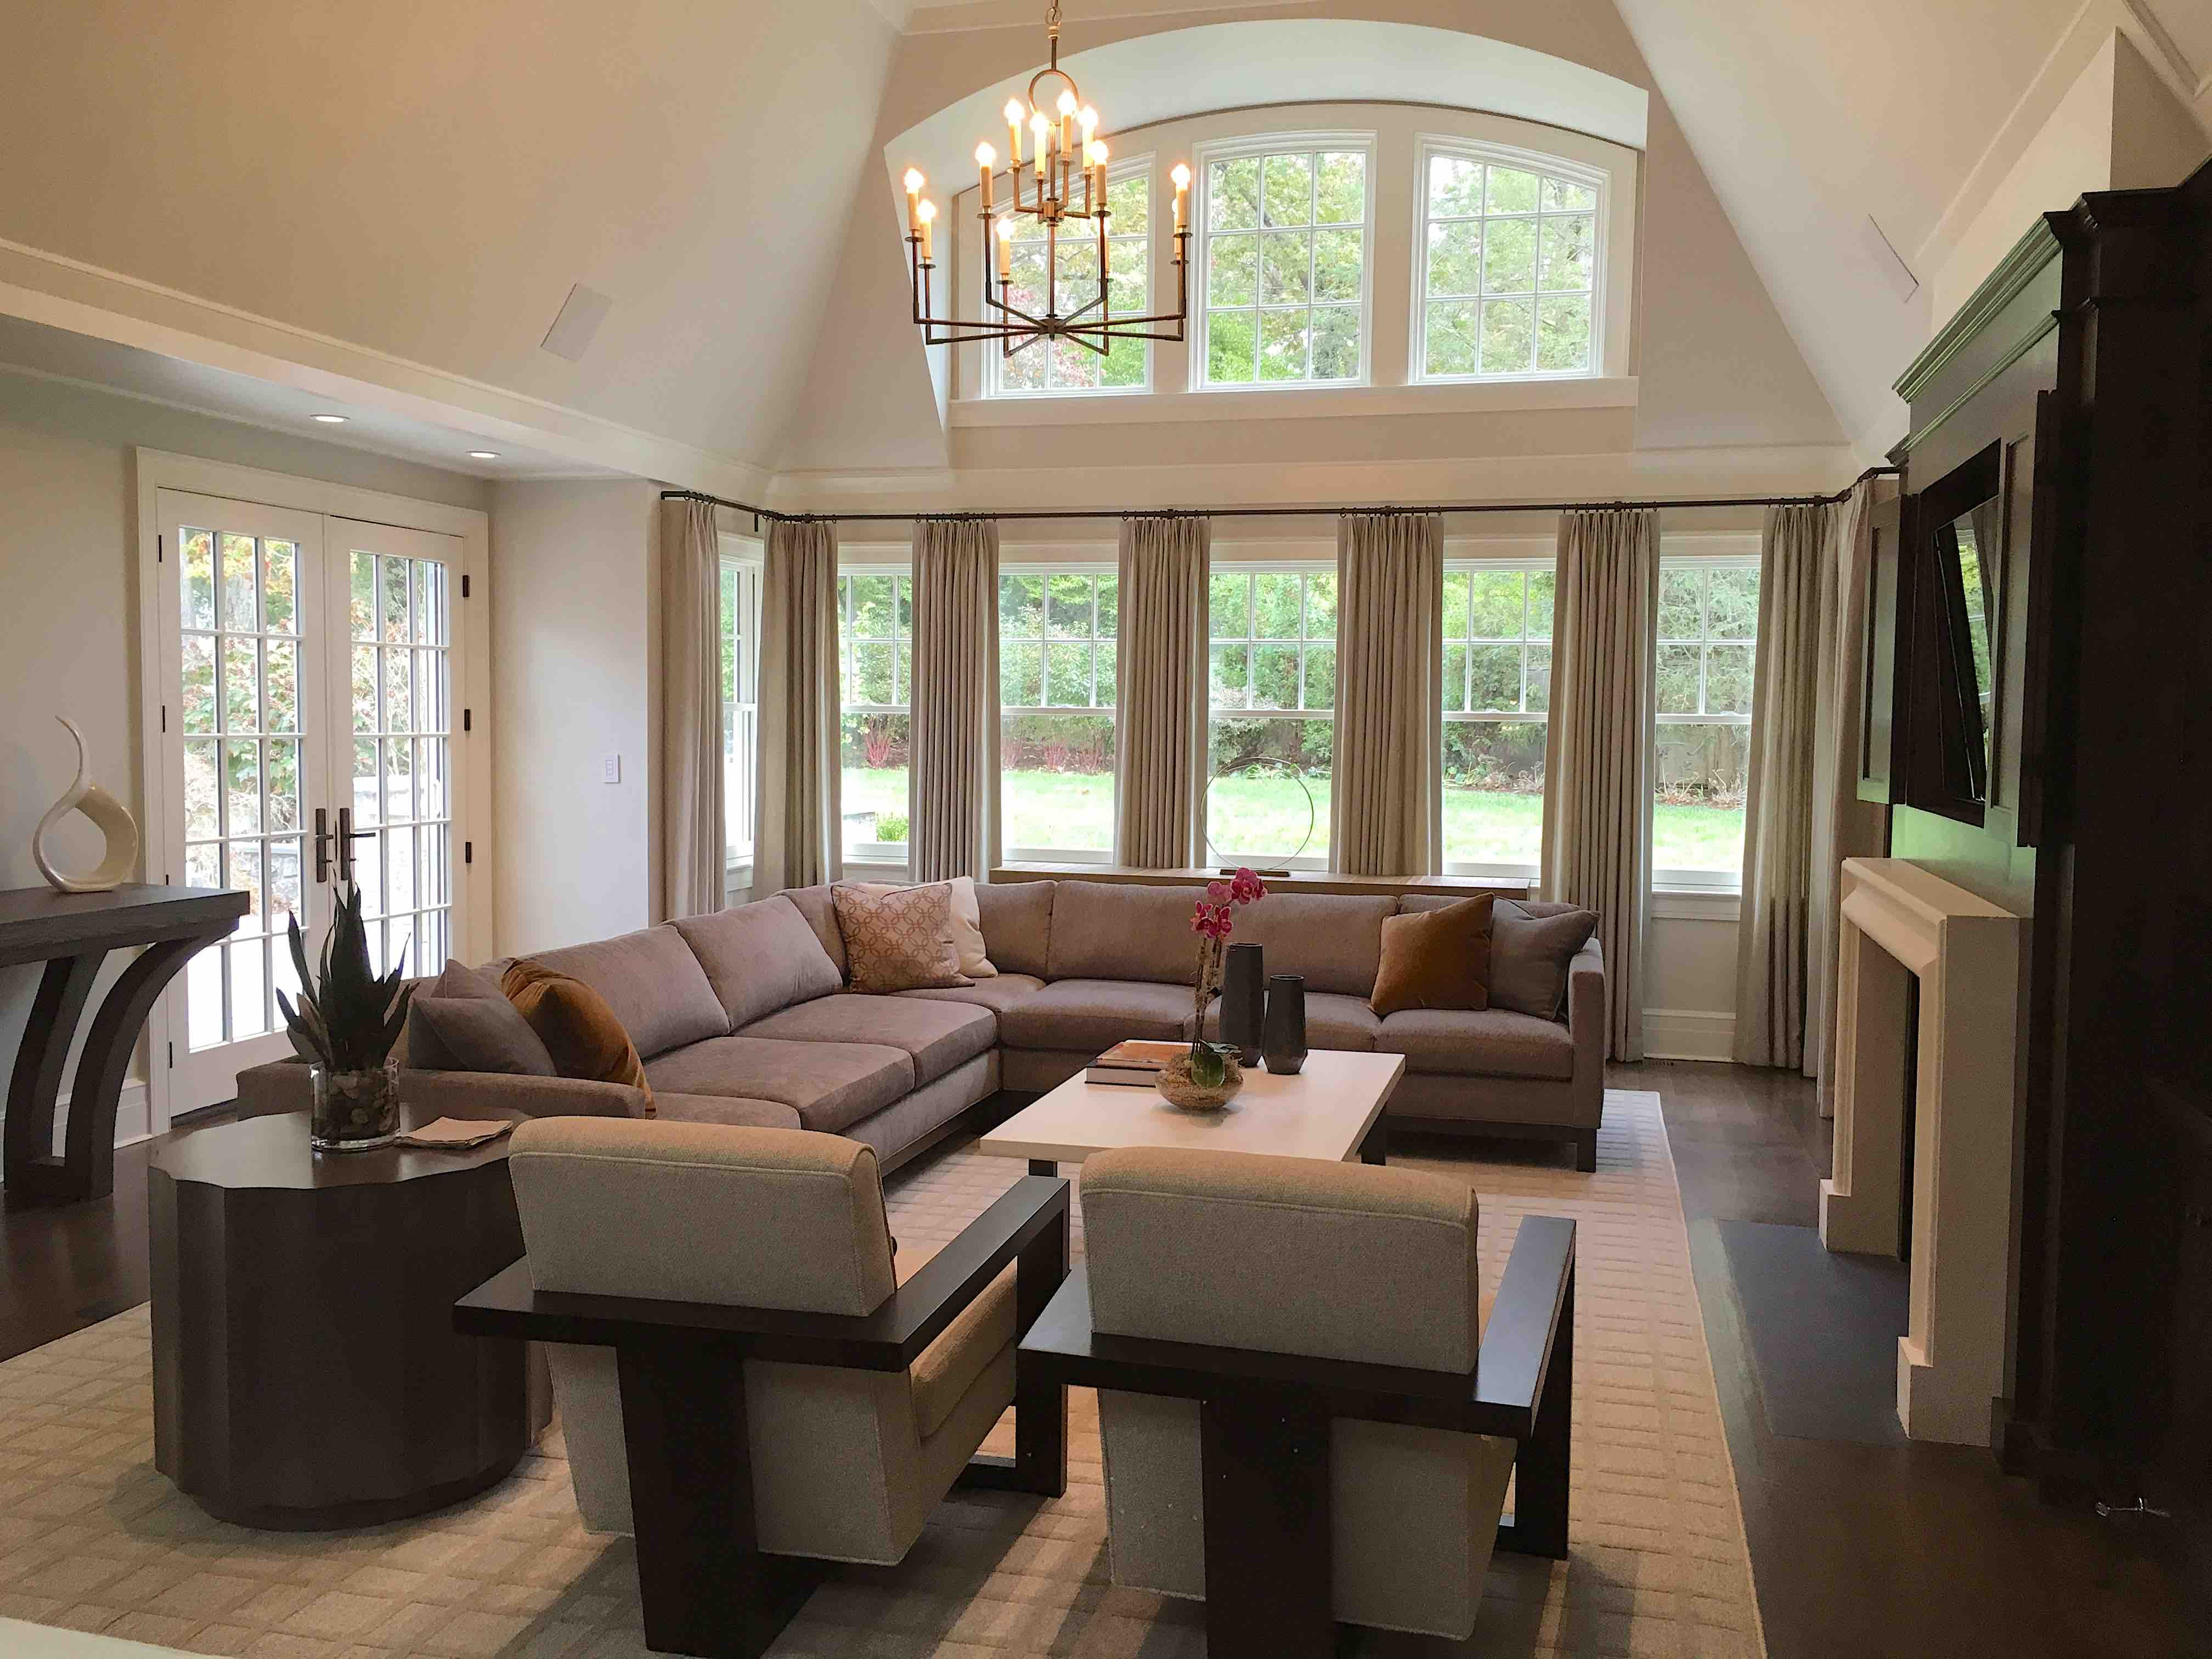 Interior Design - Family Room Decor